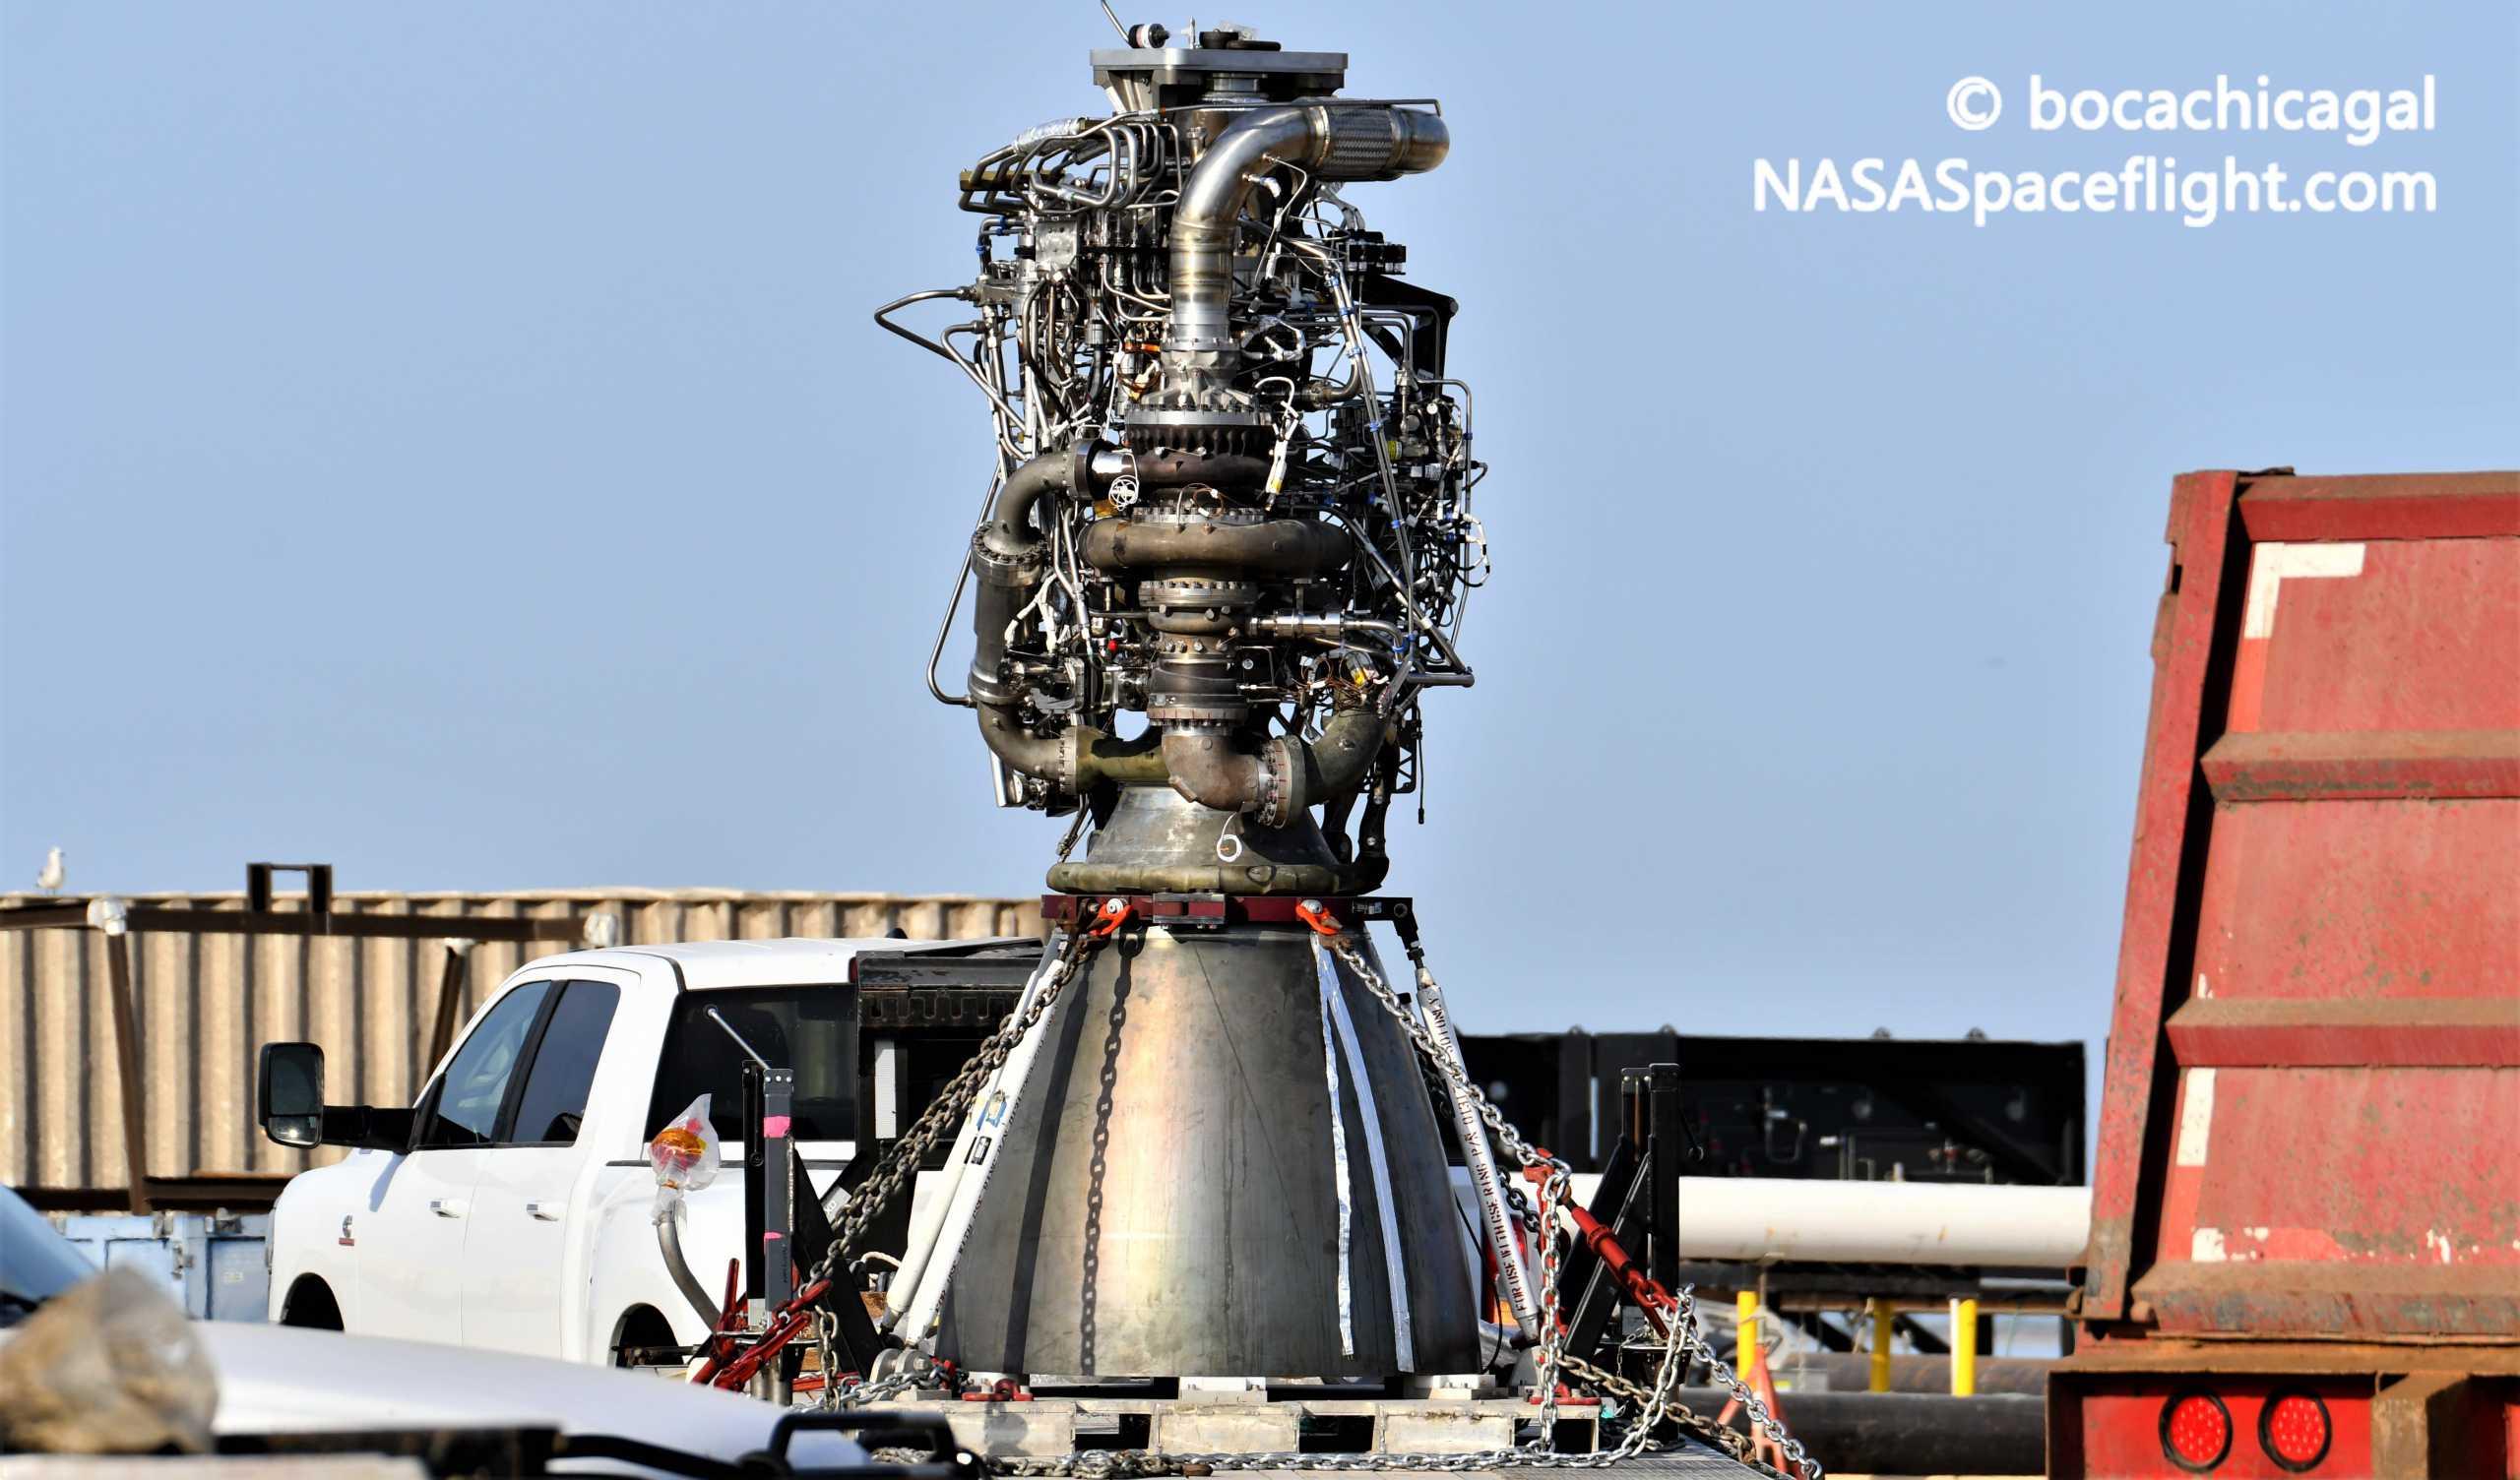 Starship Boca Chica 081820 (NASASpaceflight – bocachicagal) SN6 Raptor SN29 install 1 crop (c)